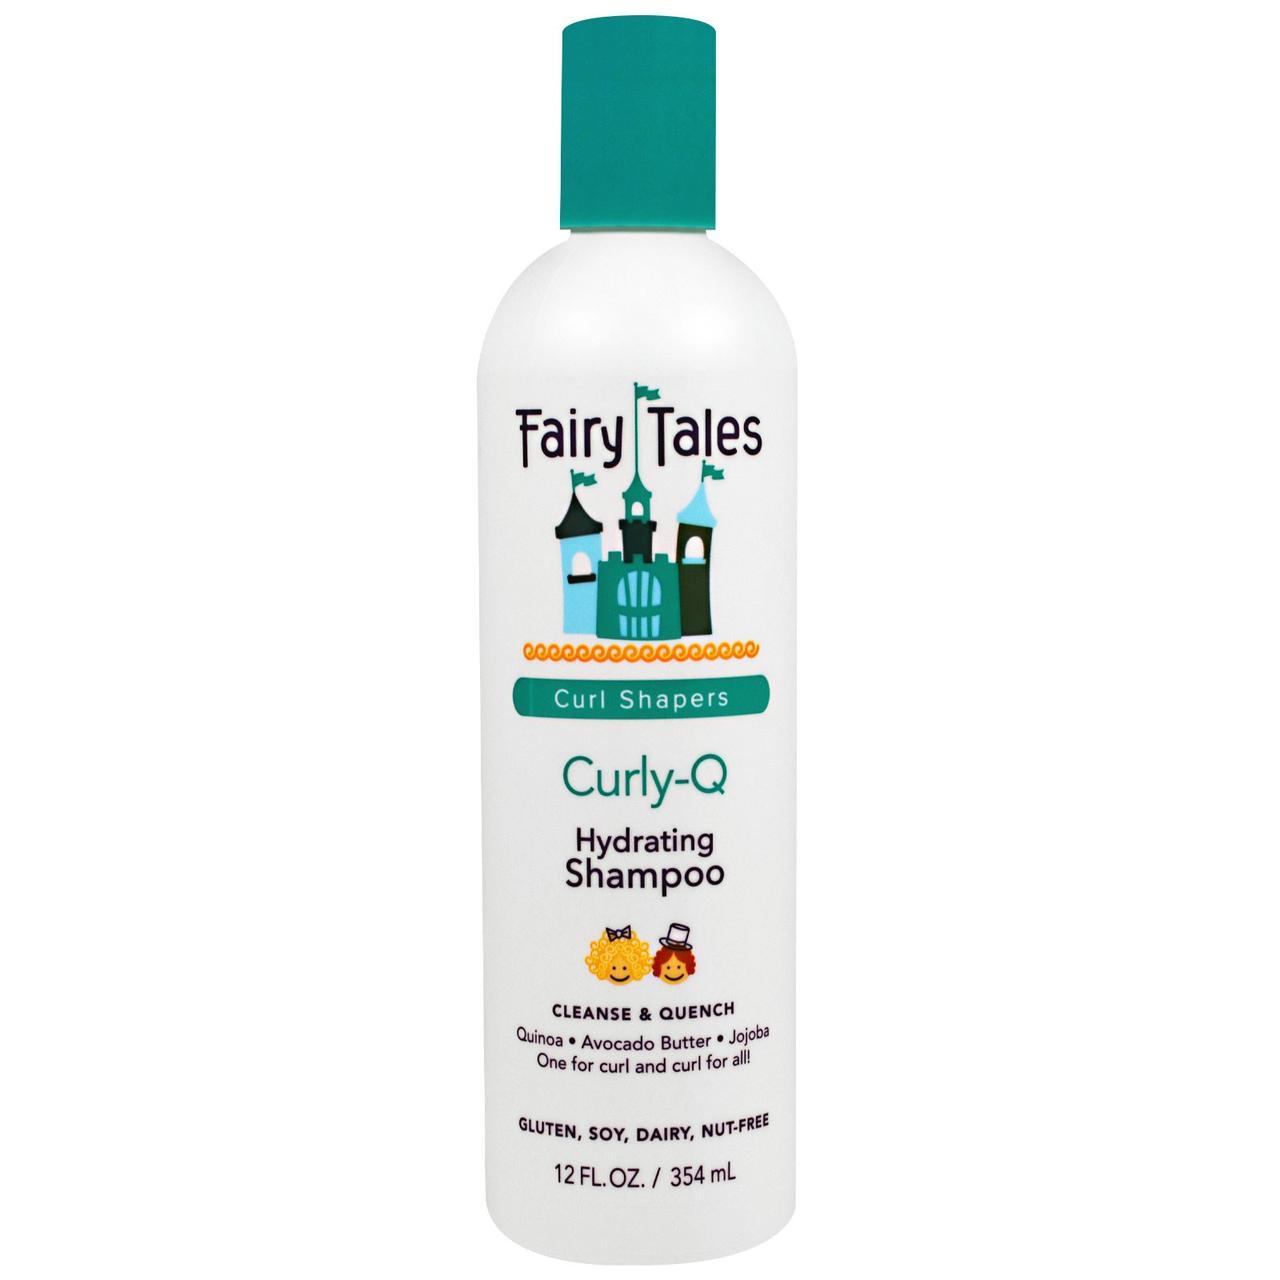 Fairy Tales, Кудри-Q, увлажняющий шампунь для вьющихся волос, 12 жидких унций (354 мл)